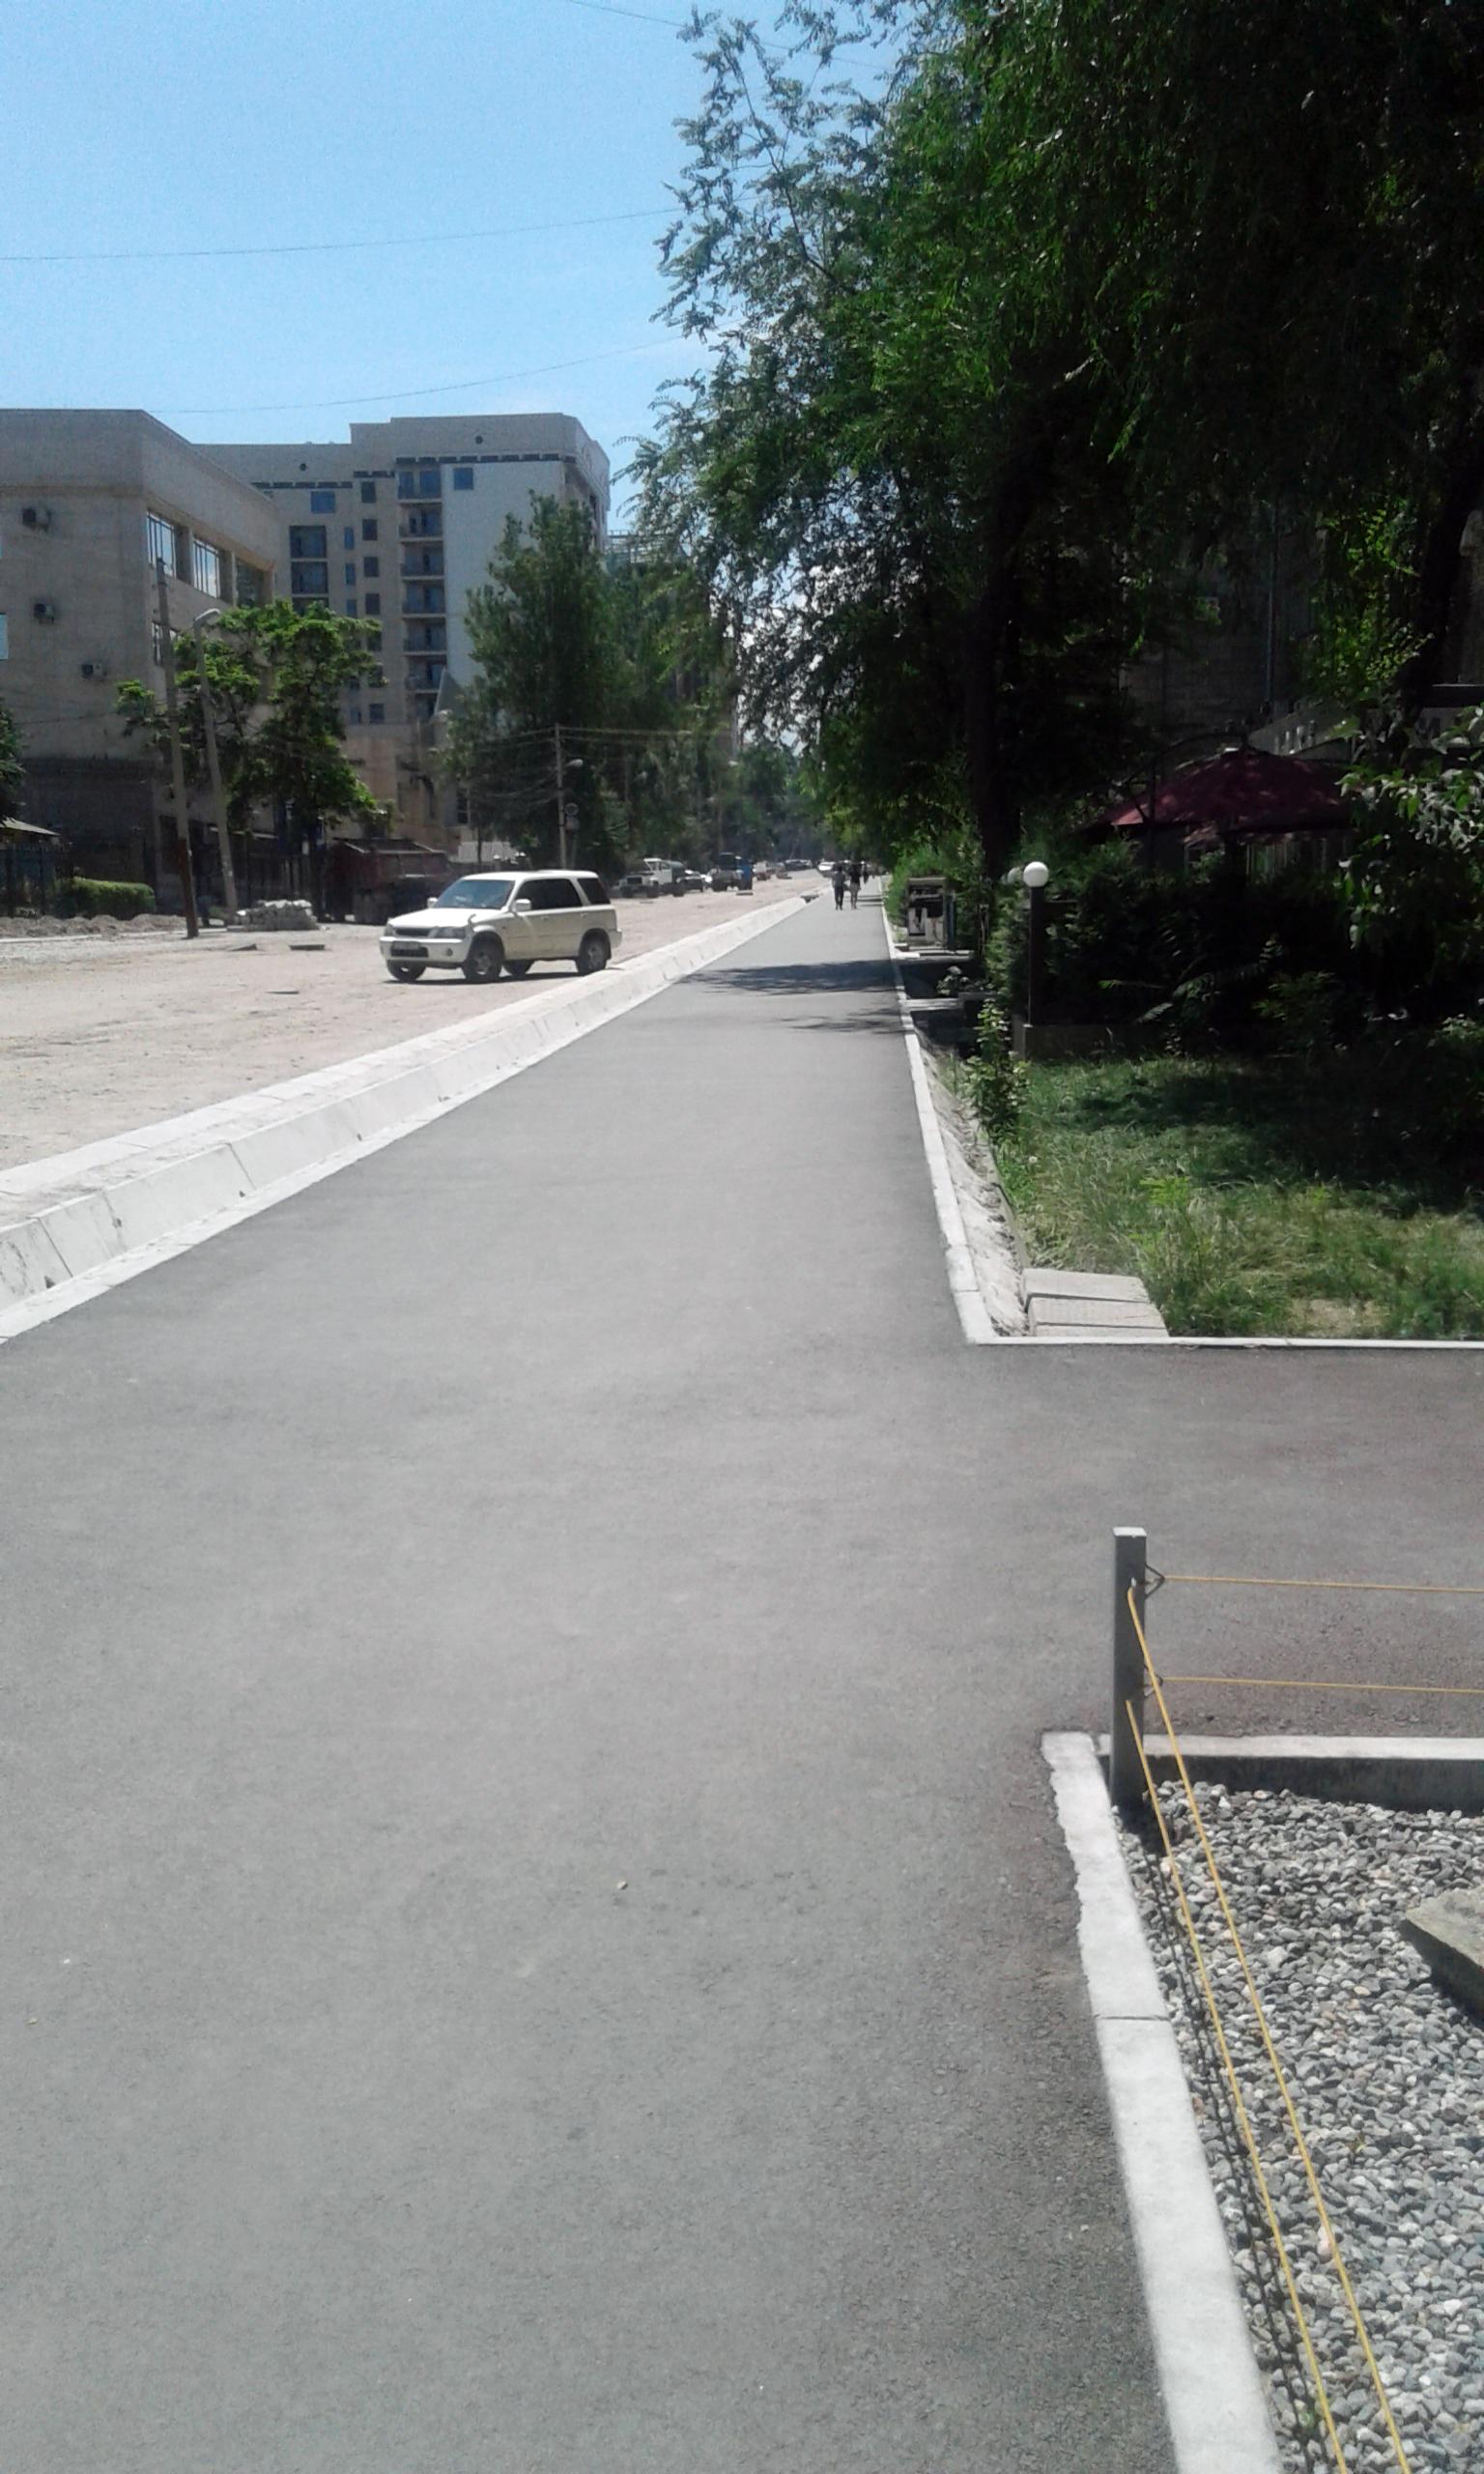 A newly laid asphalt footpath